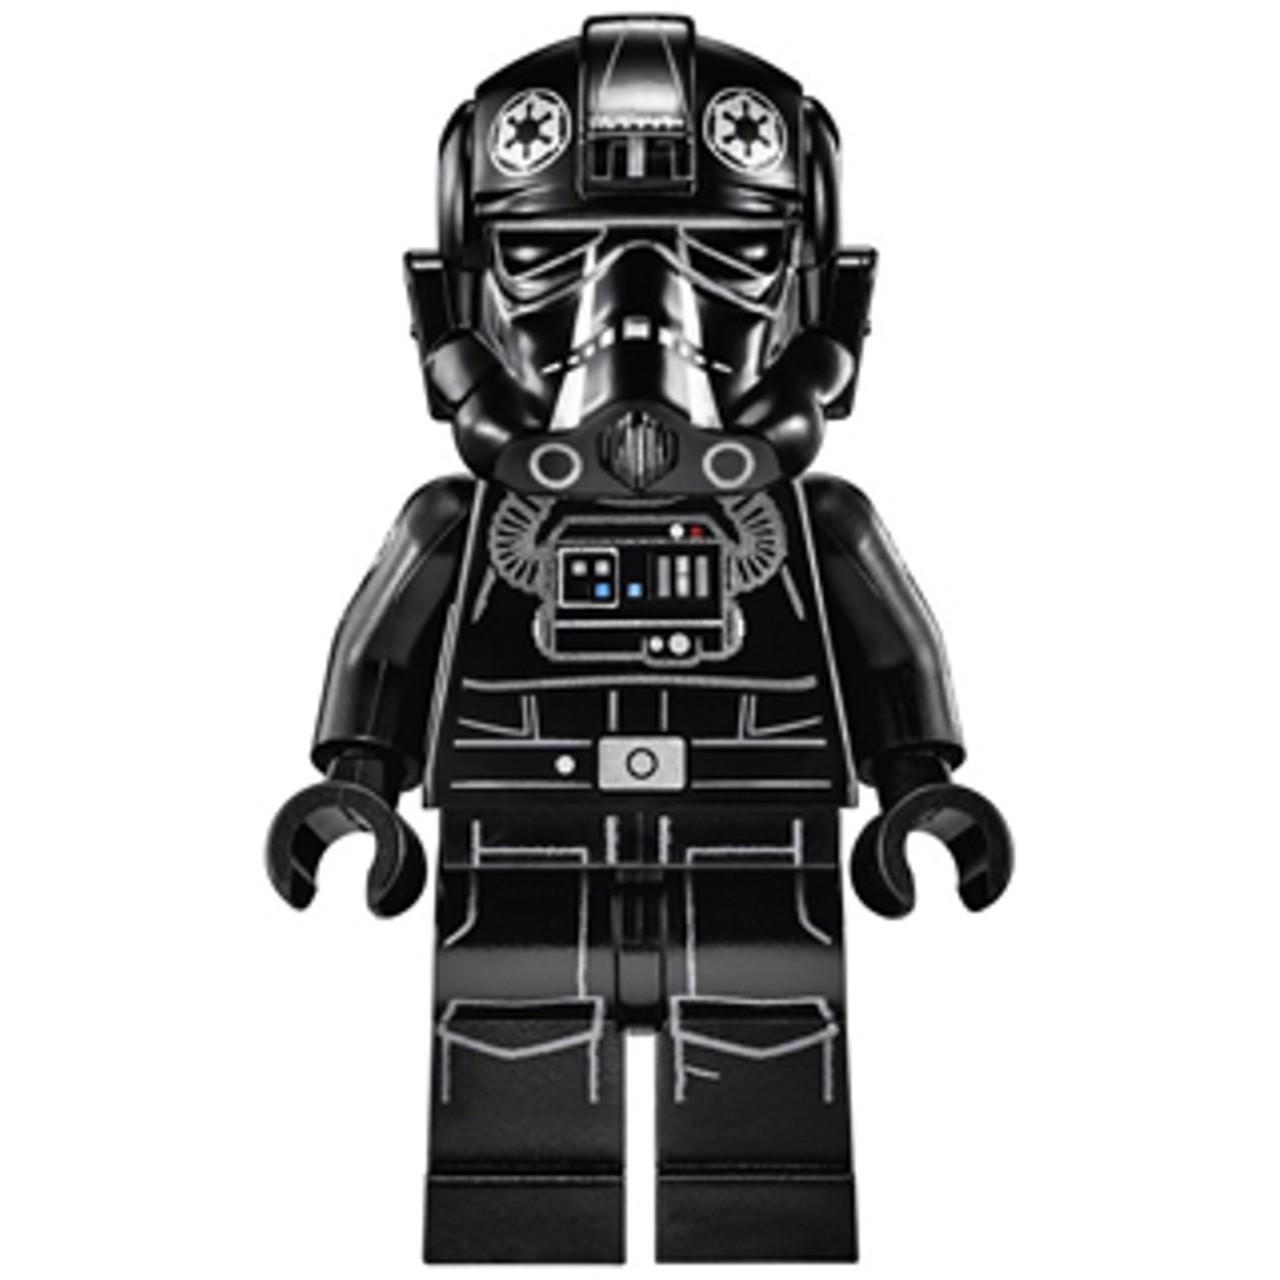 LEGO Tie Pilot - Star Wars